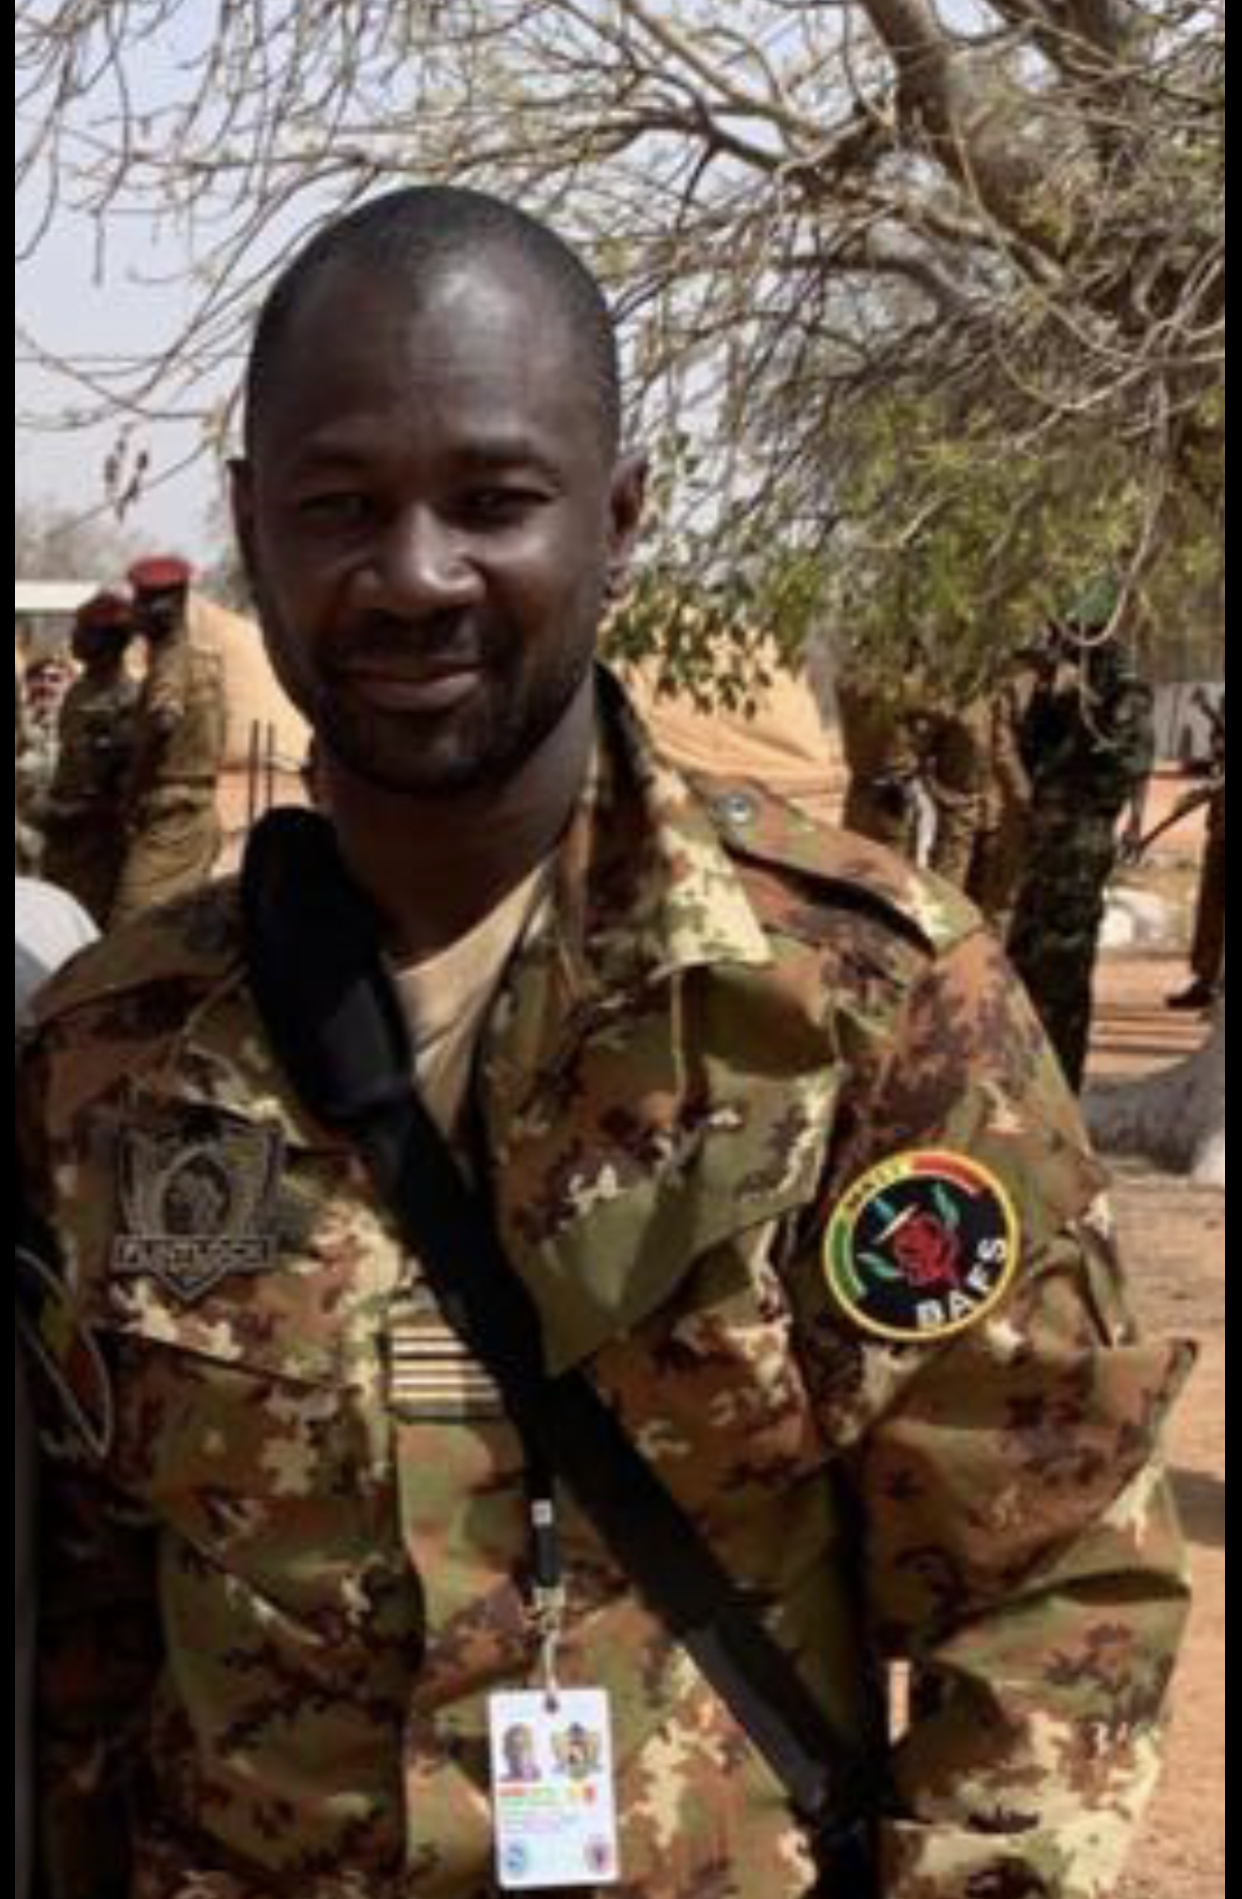 MALI : Le colonel Assimi Goita est le chef de la junte militaire au pouvoir.